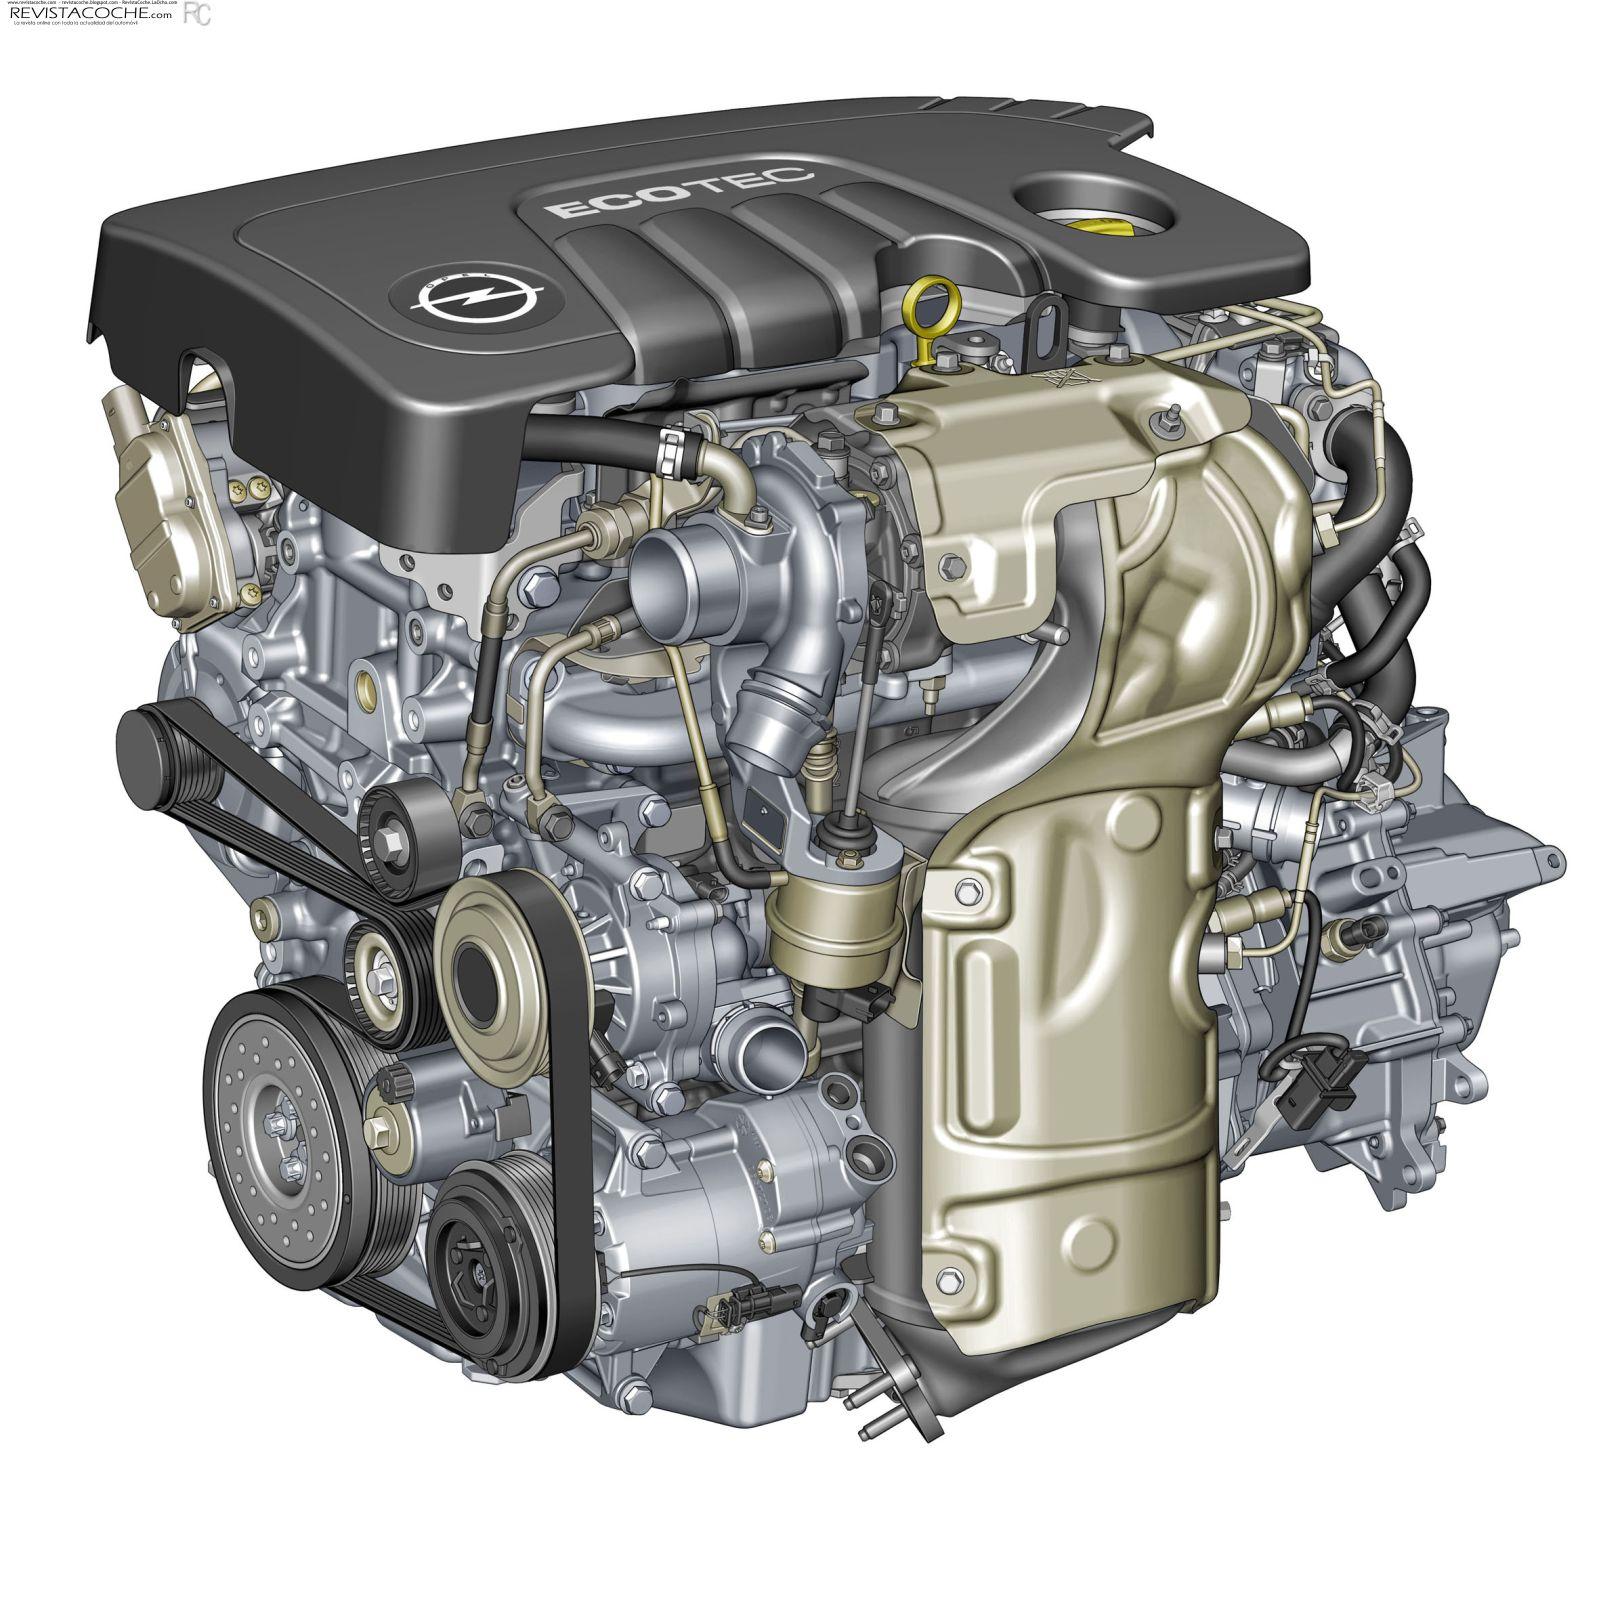 2004 Hyundai Accent Engine Diagram Mercury Energy Level 2010 Free